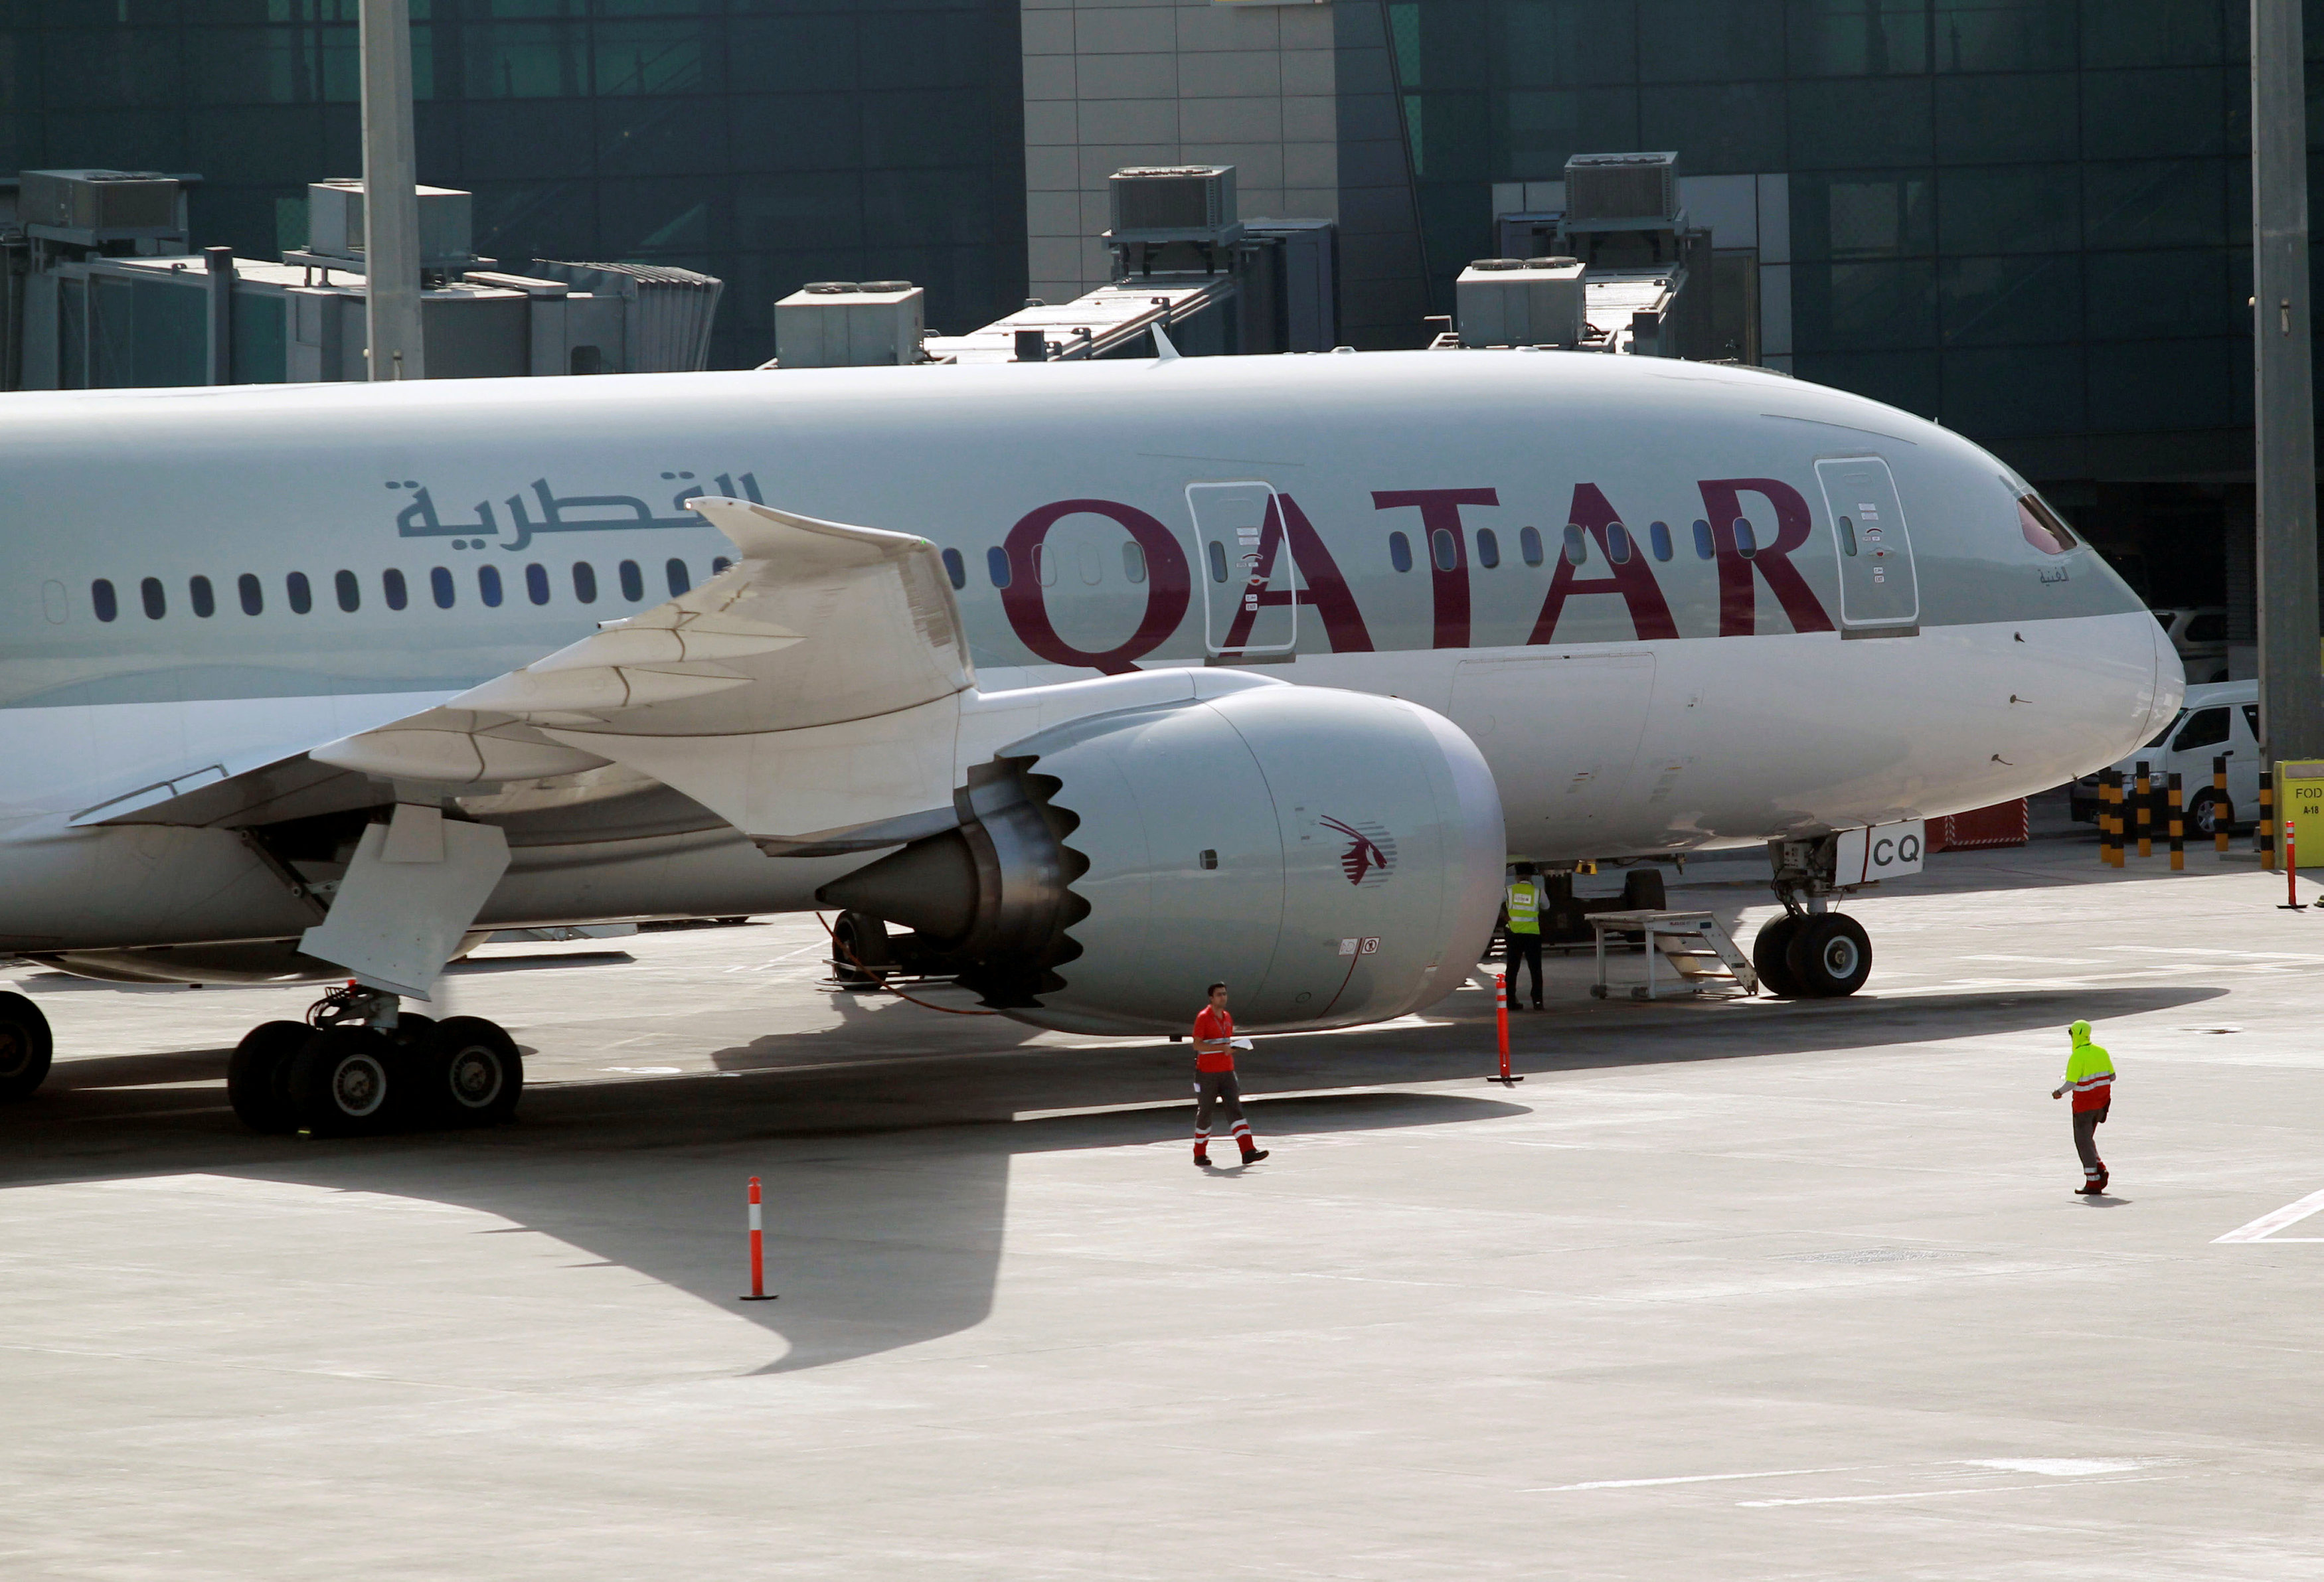 A Qatar Airways aircraft is seen at Hamad International Airport in Doha, Qatar on June 7, 2017. (REUTERS/Naseem Zeitoon)